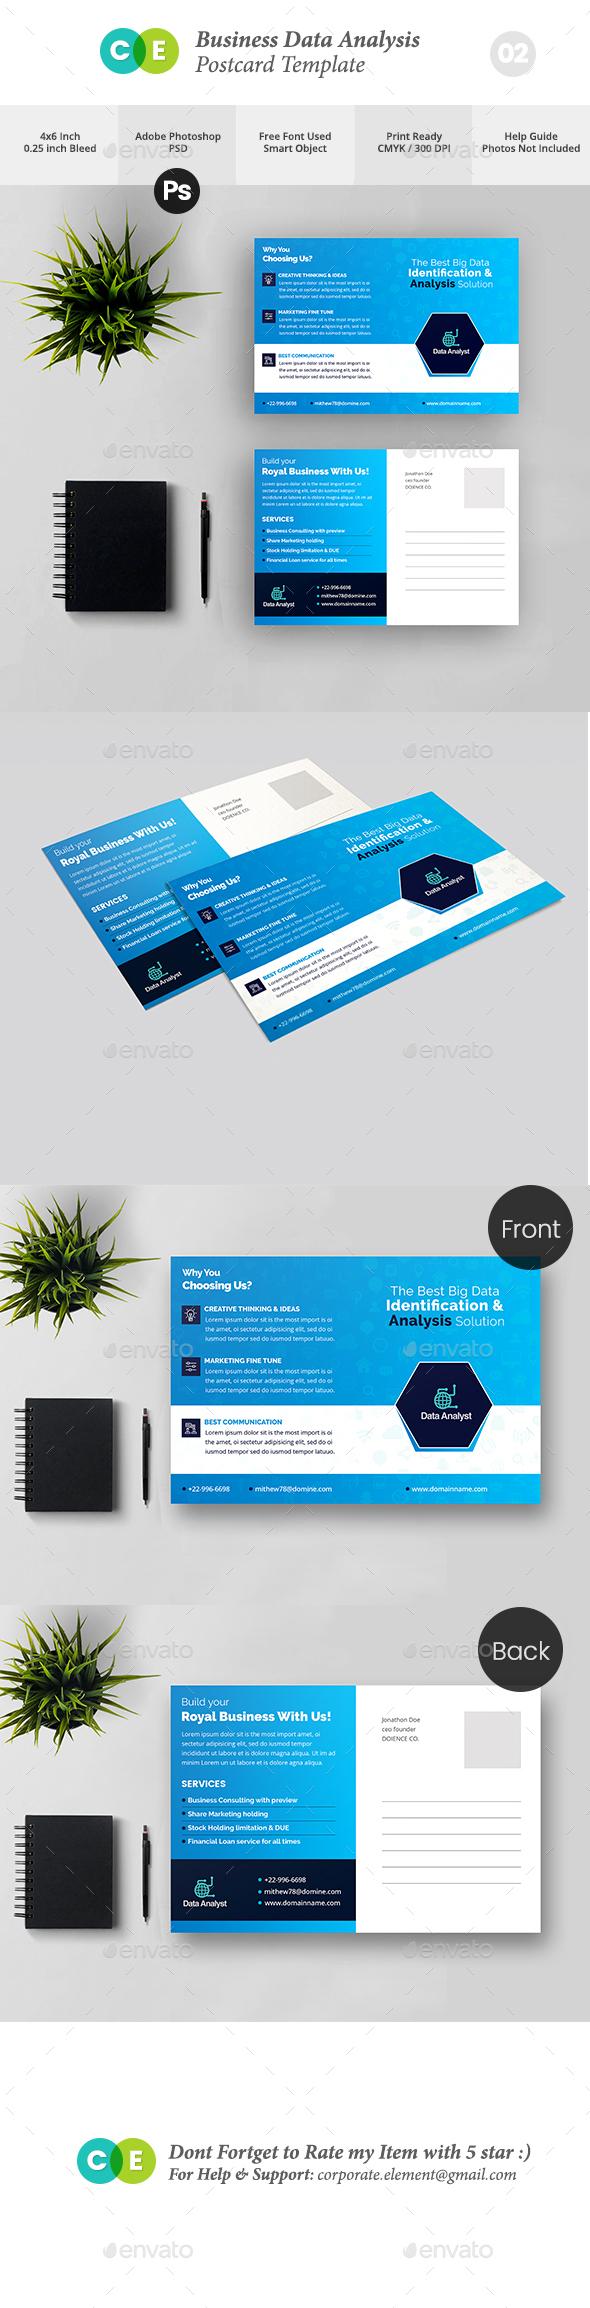 Pro Business Data Analysis Postcard V02 - Cards & Invites Print Templates